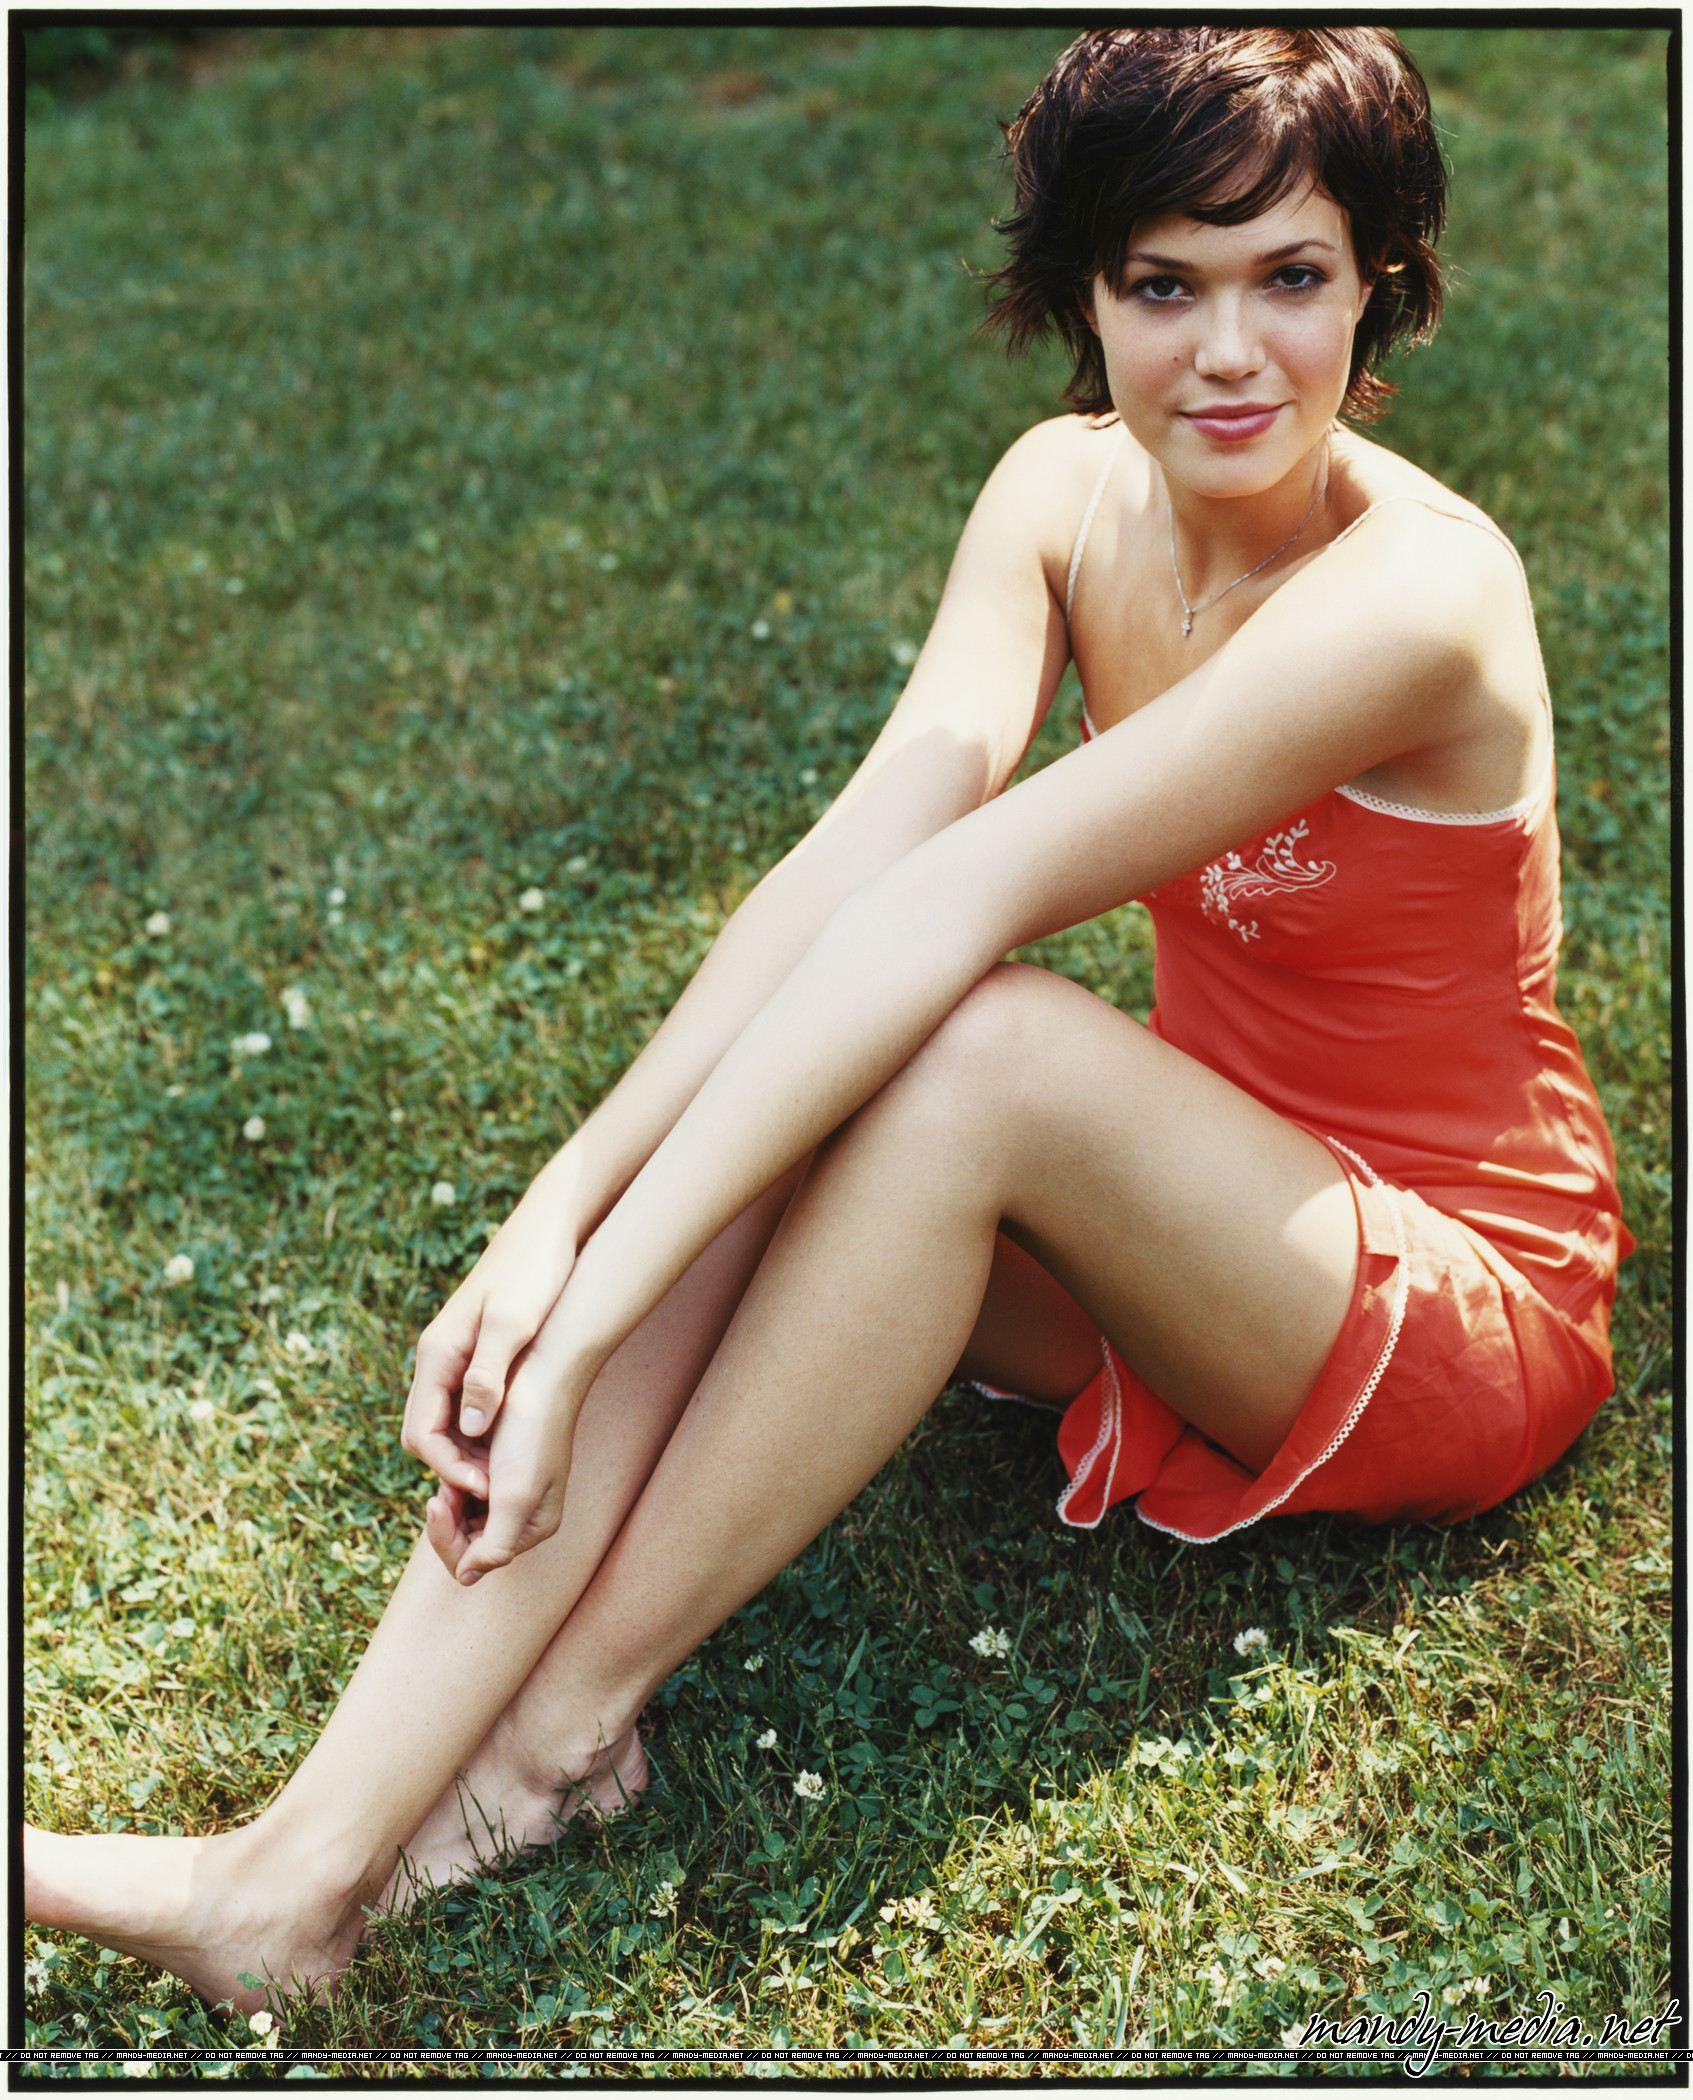 https://pics.wikifeet.com/Mandy-Moore-Feet-94475.jpg